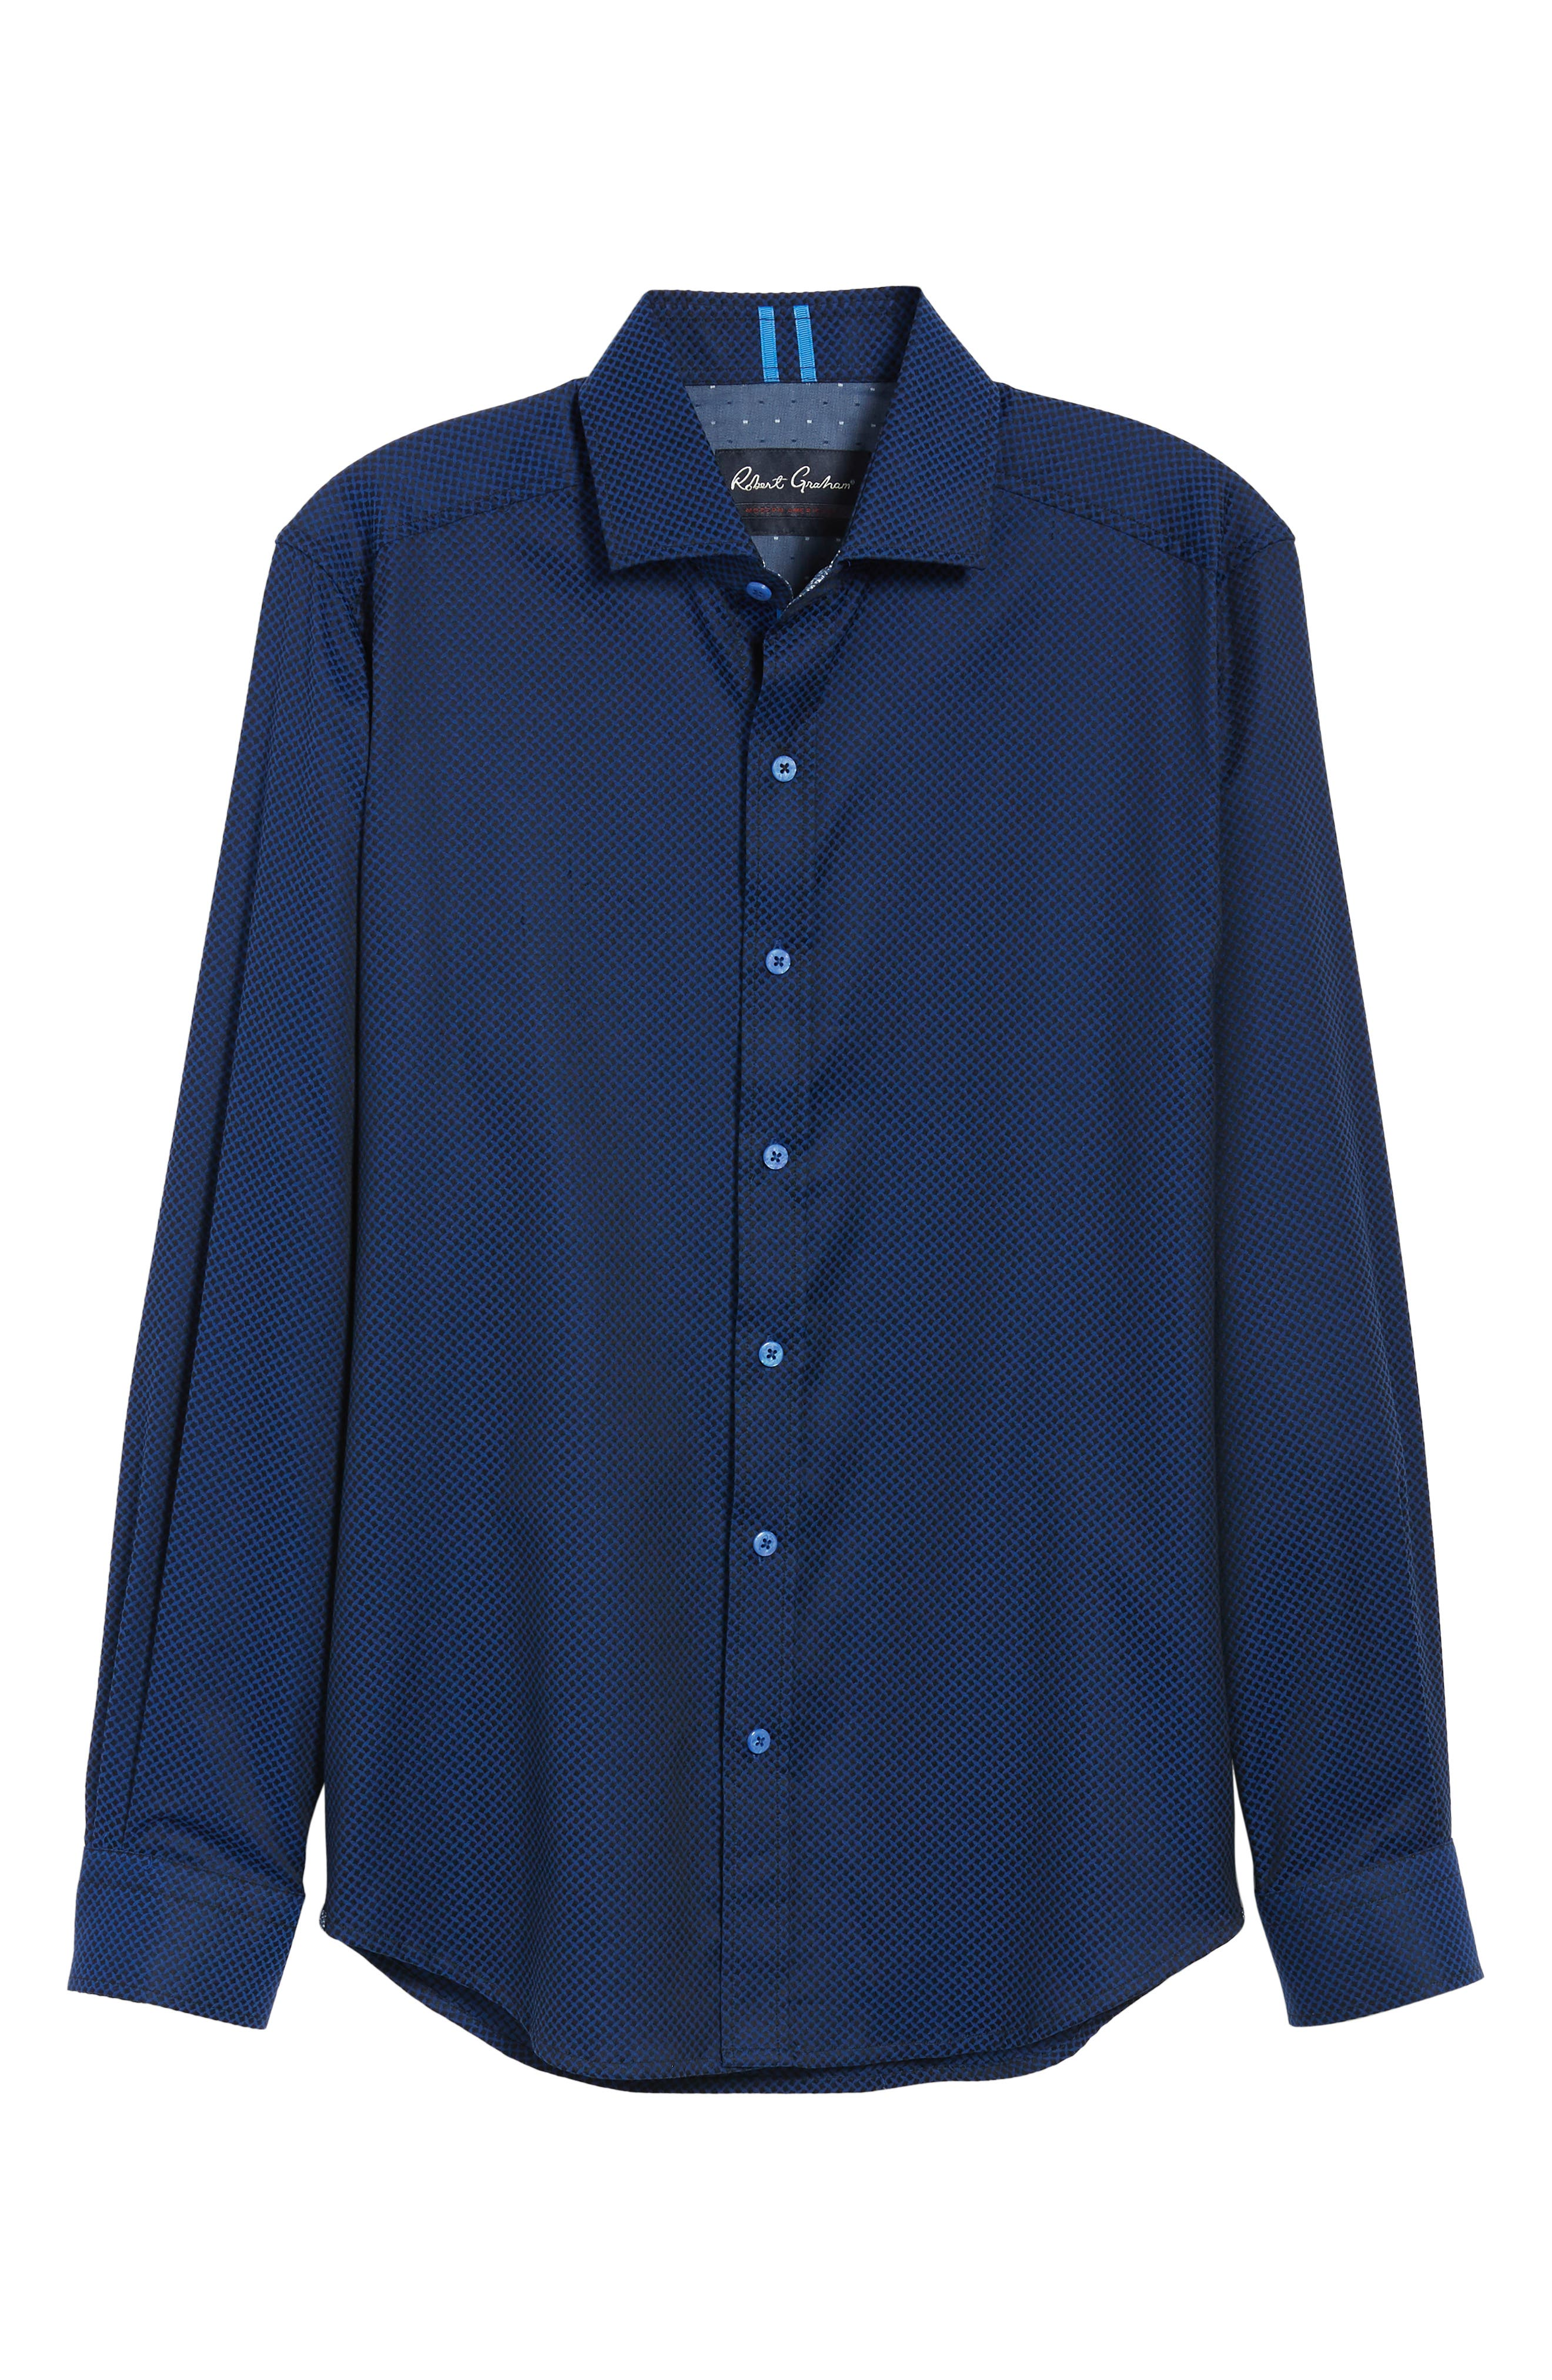 Anson Tailored Fit Jacquard Sport Shirt,                             Alternate thumbnail 5, color,                             NAVY